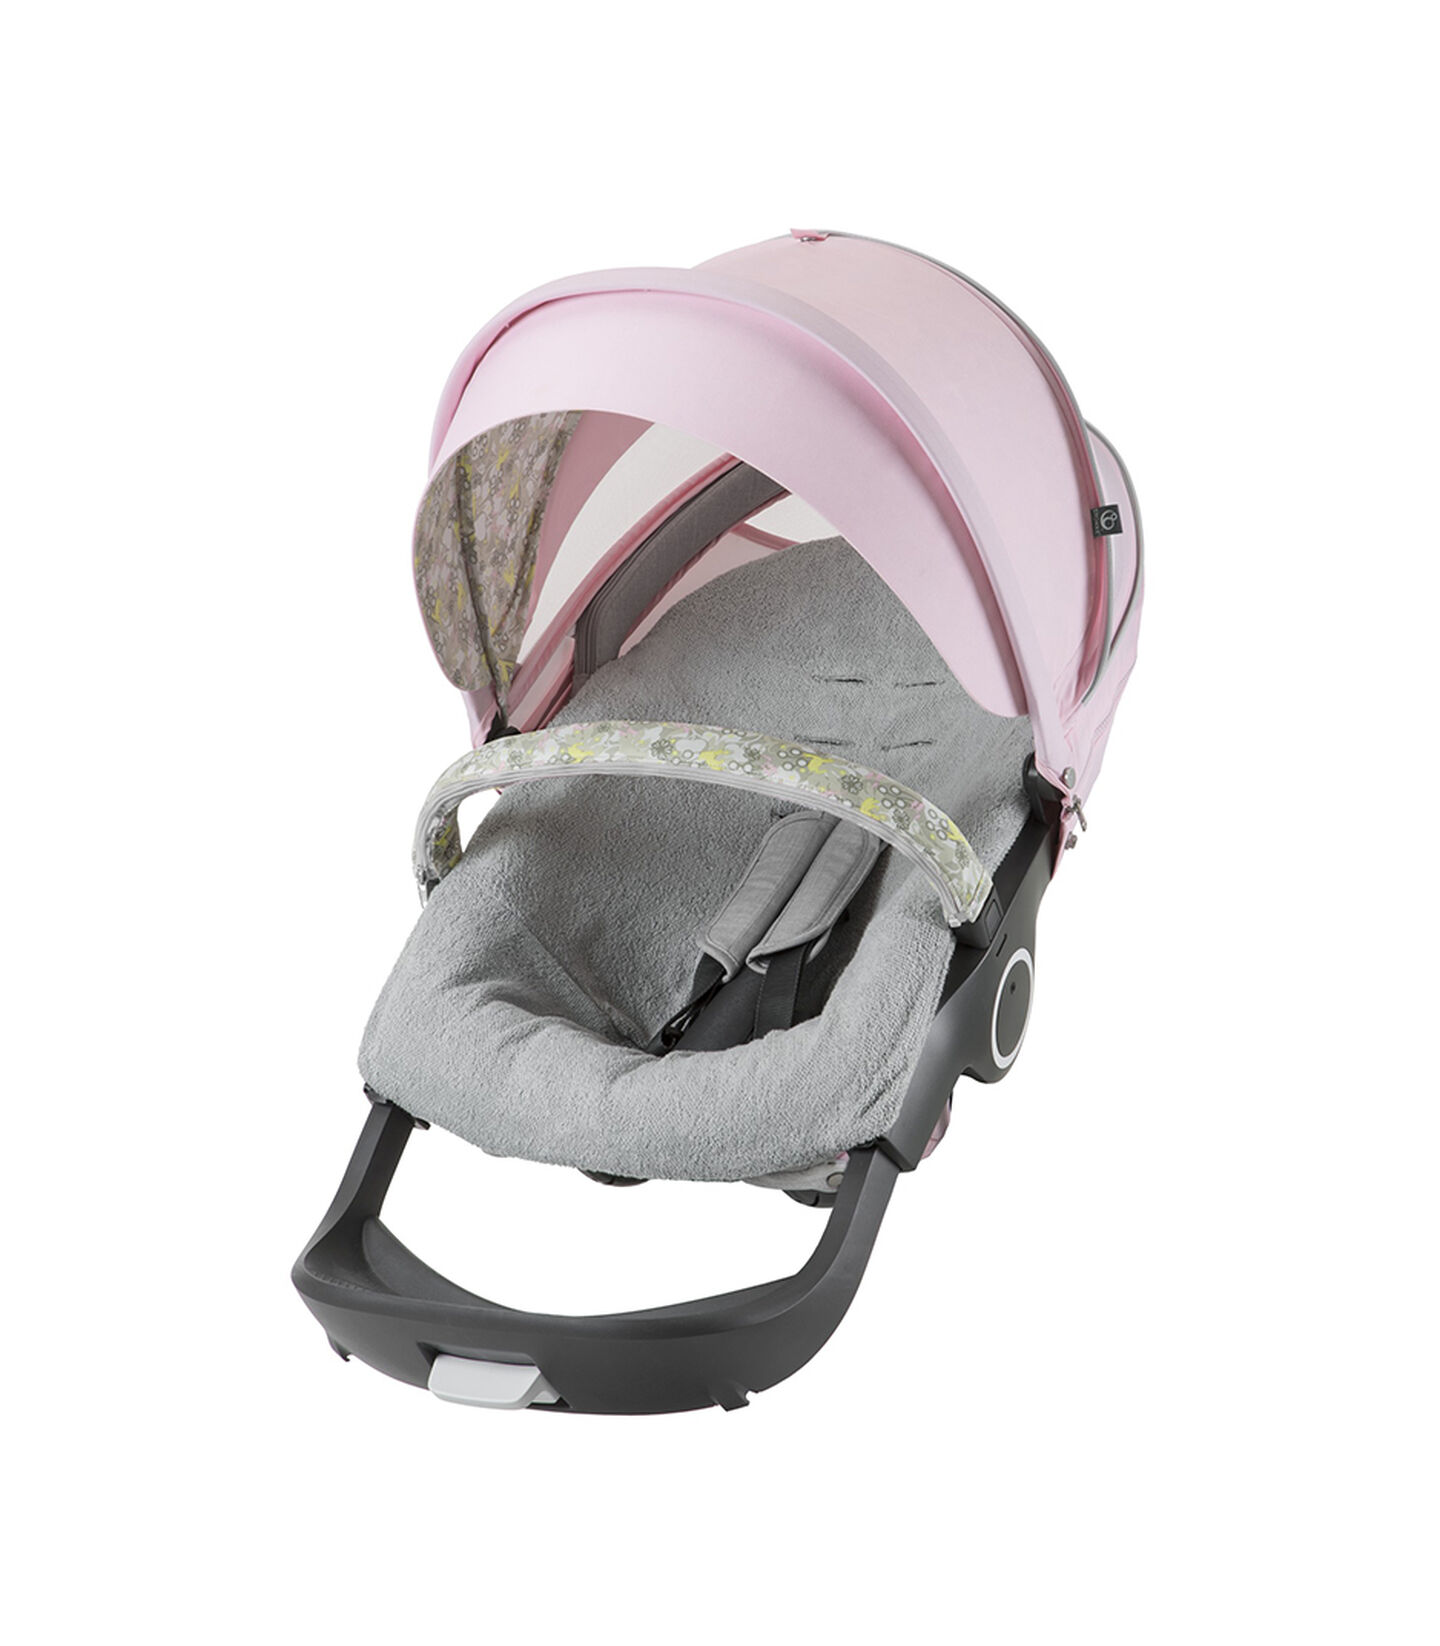 Stokke® Stroller seat with Flora Pink Summer Kit.